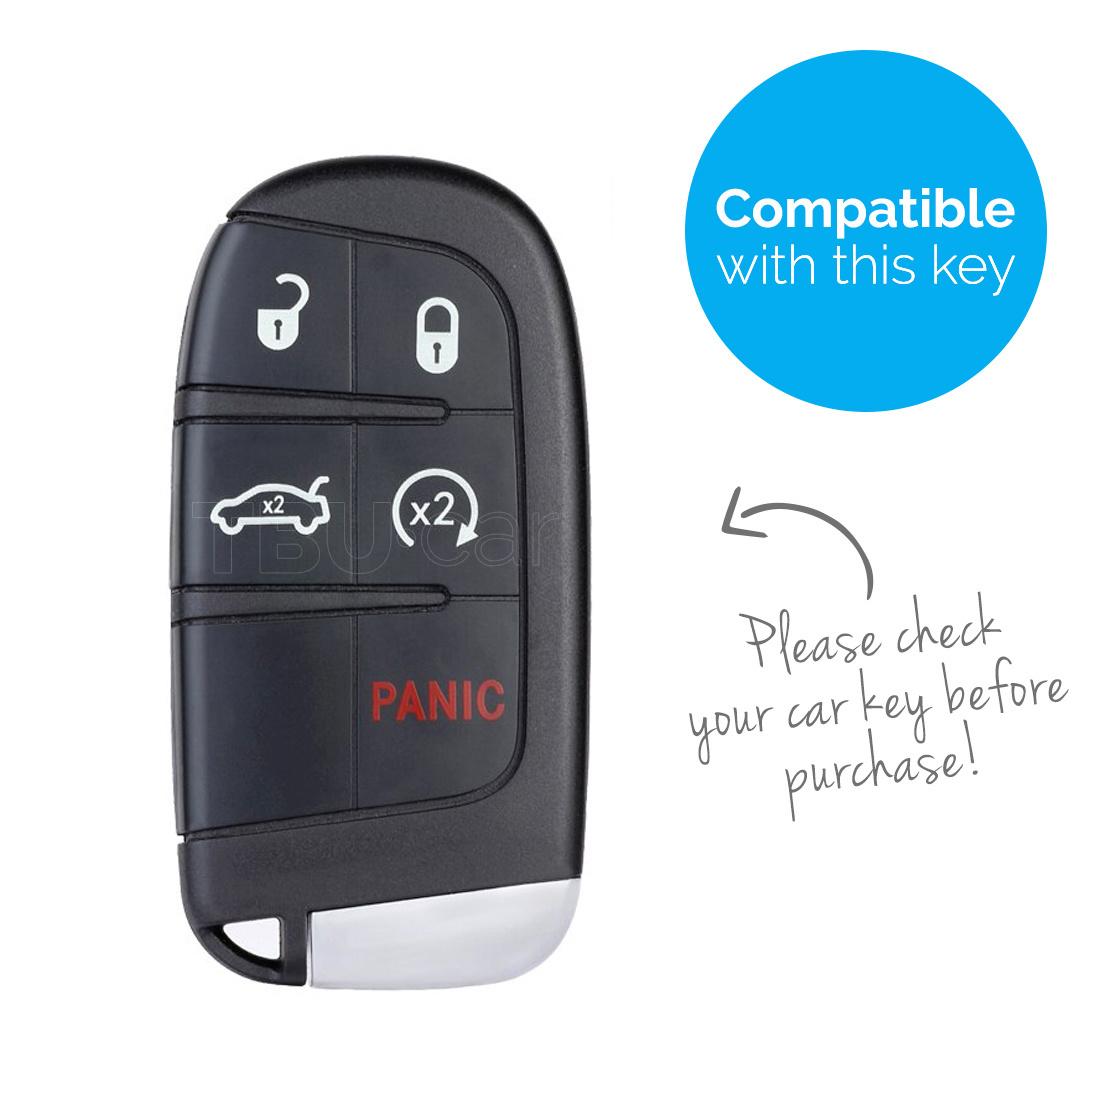 TBU car TBU car Autoschlüssel Hülle kompatibel mit Fiat 5 Tasten (Keyless Entry) - Schutzhülle aus Silikon - Auto Schlüsselhülle Cover in Rosa